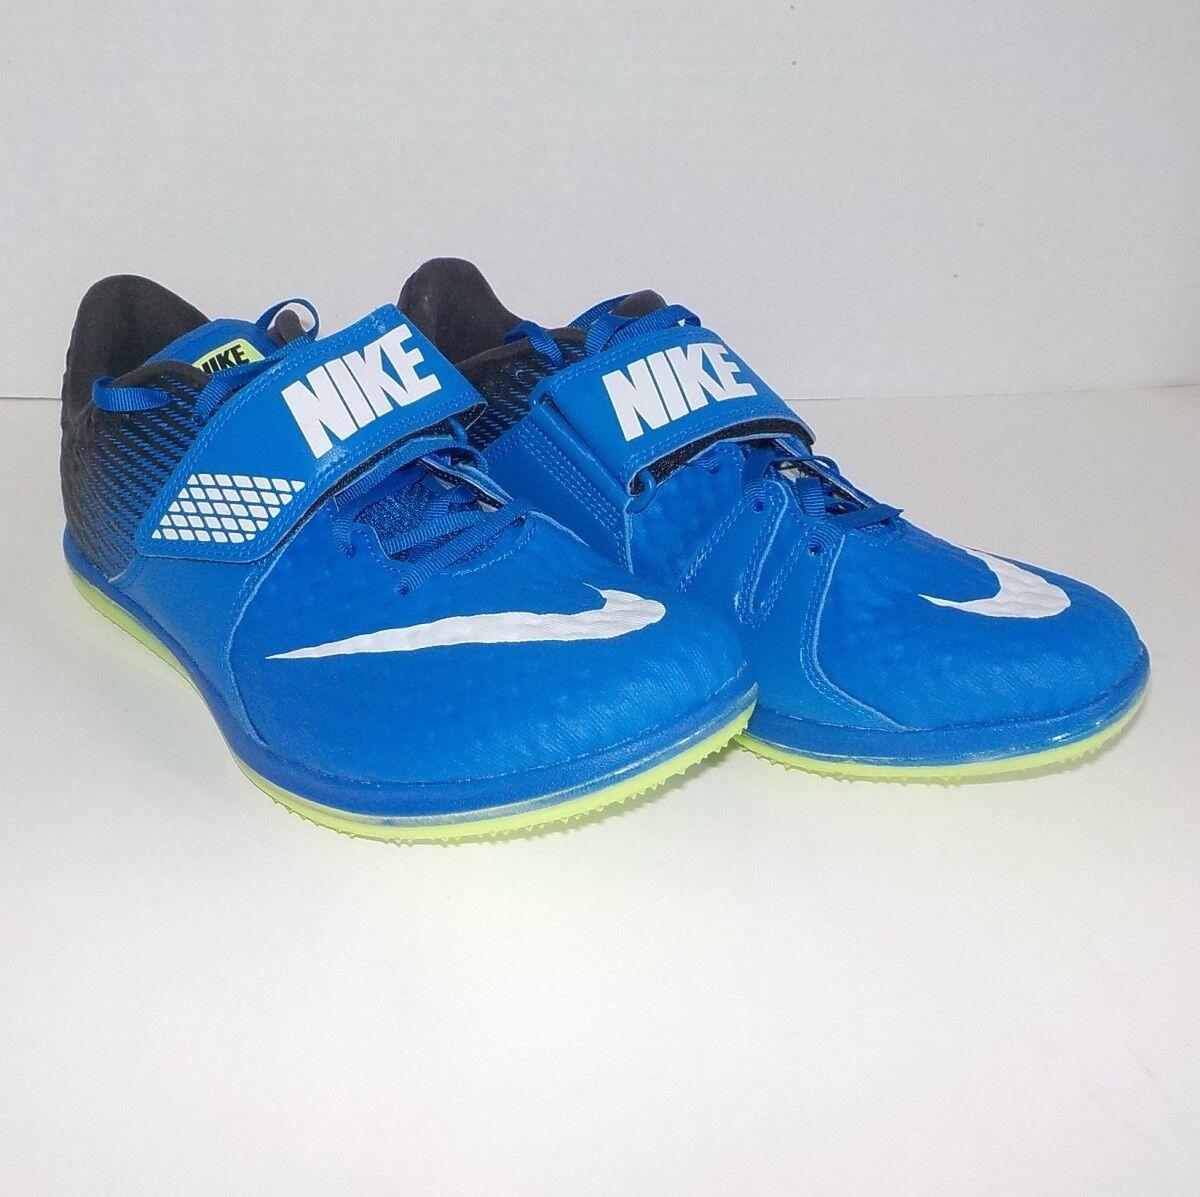 Nike HIGH JUMP ELITE HJ Track Field BLUE BLACK +Spikes 806561 413 SIZE 10 +Spikes BLACK & SRT 91d7f3